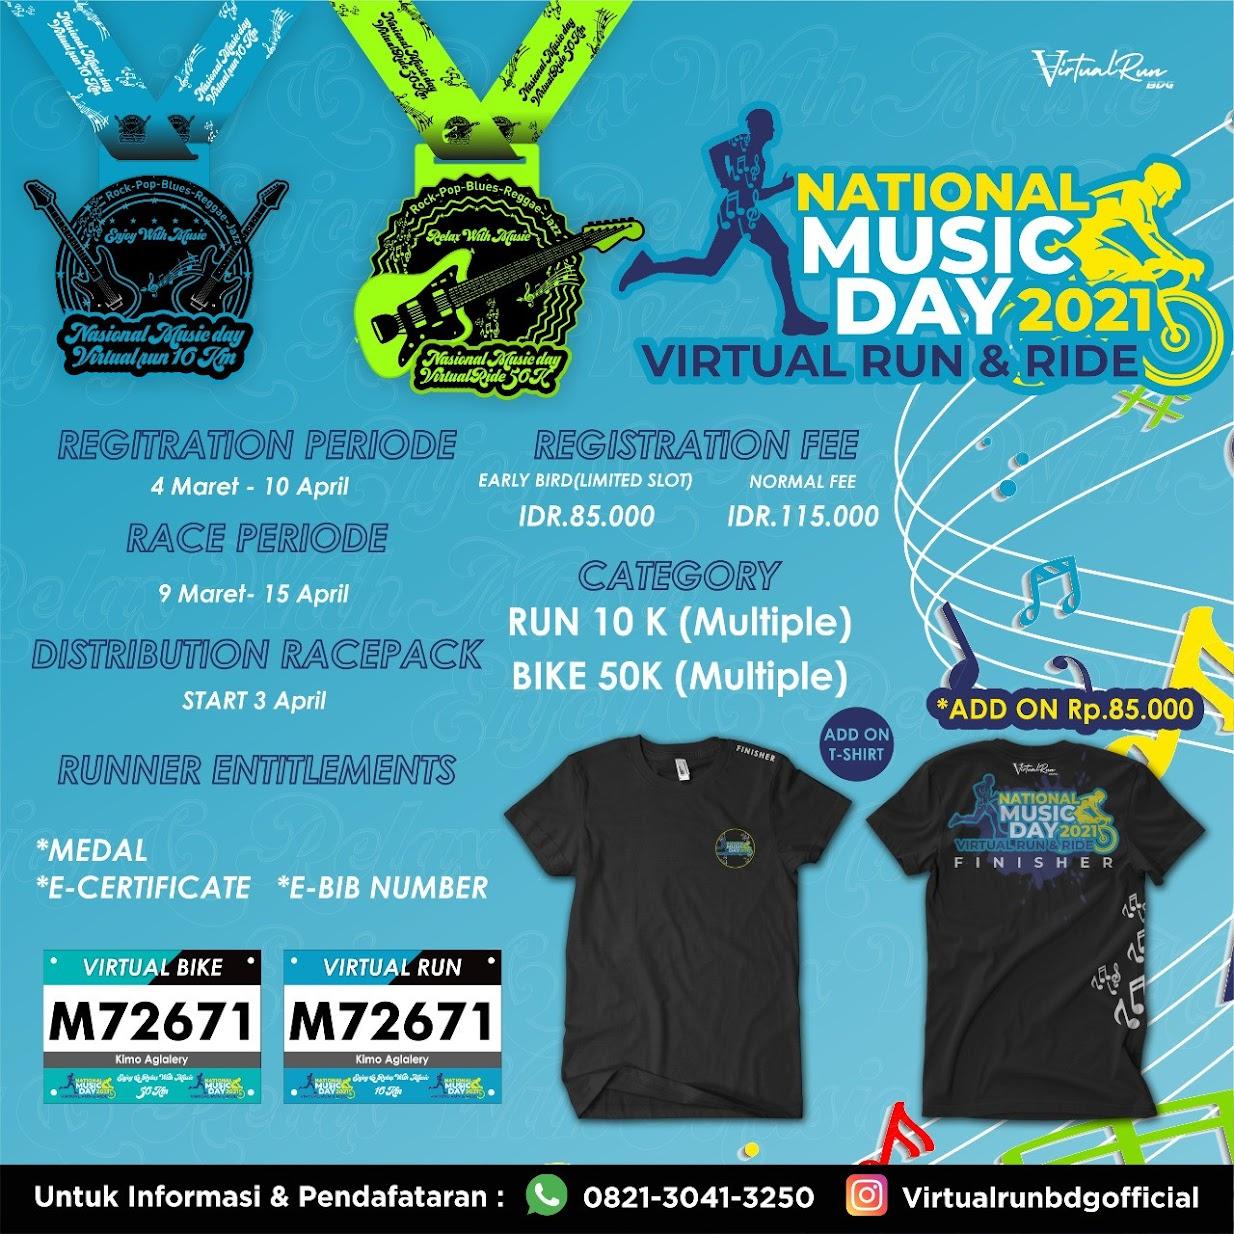 National Music Day - Virtual Run & Ride • 2021